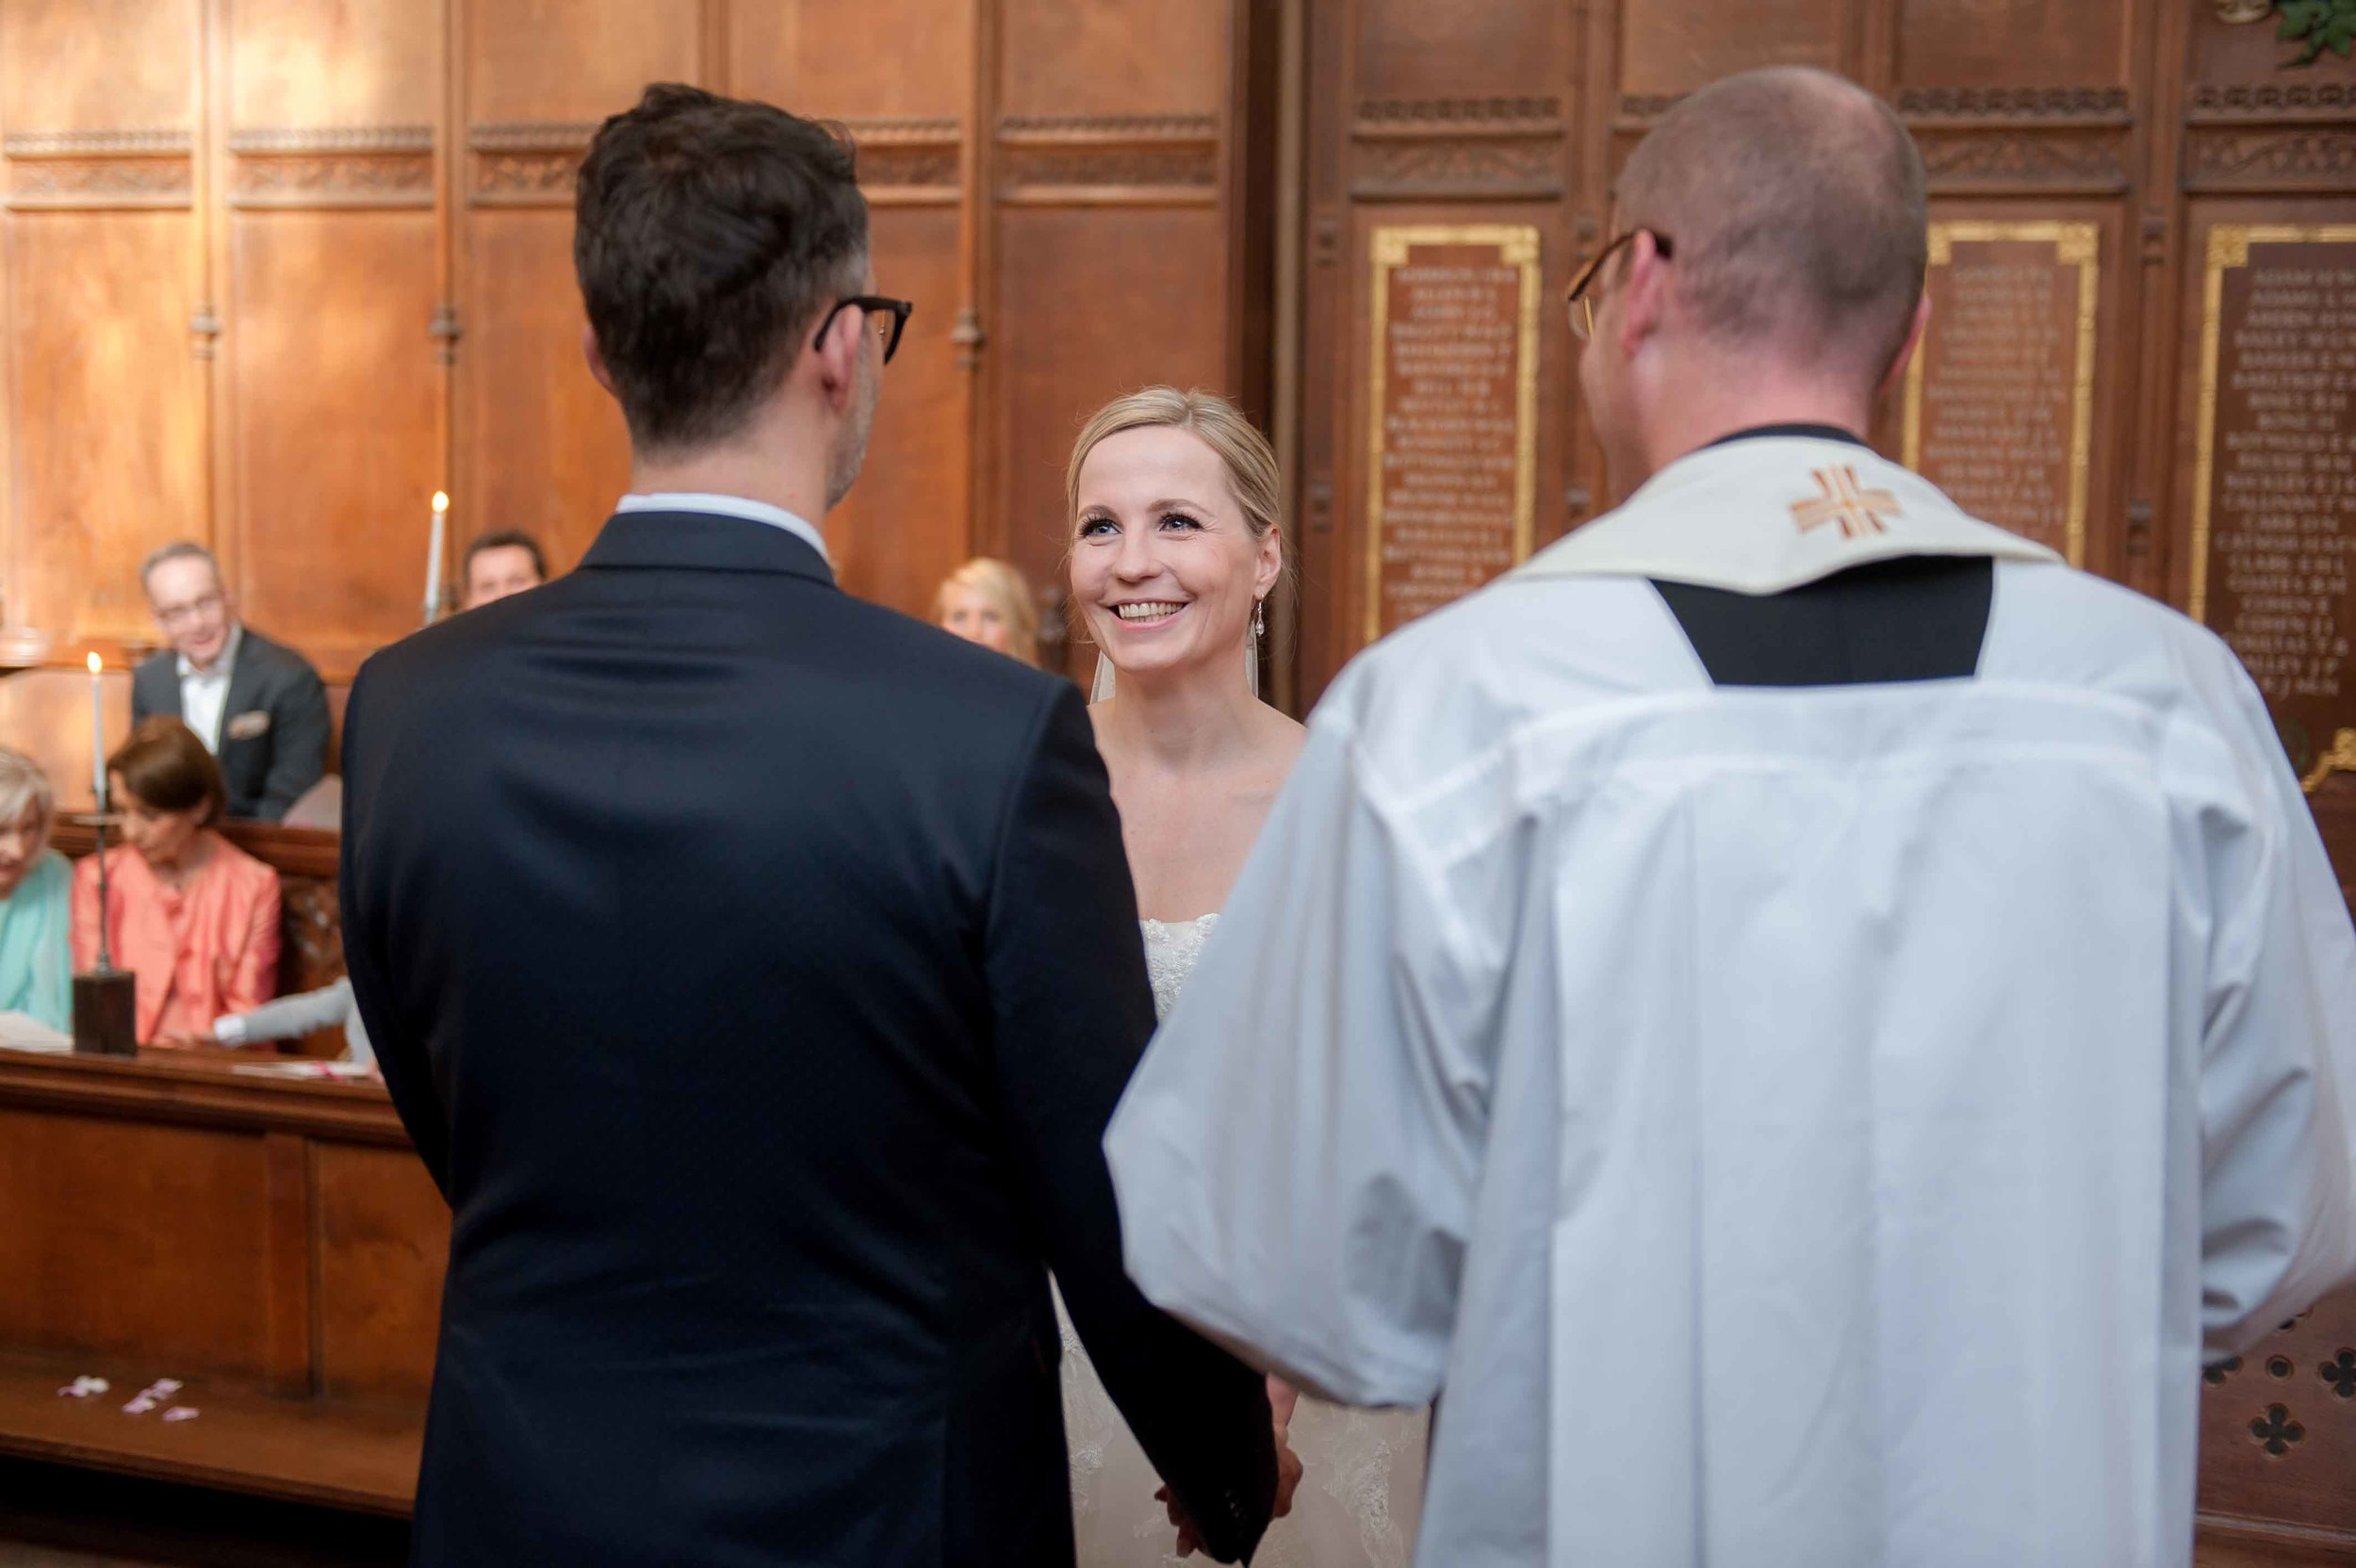 Adrian_Nicole_Charnwood_Weddings_Queens_College_Cambridge-1021.jpg